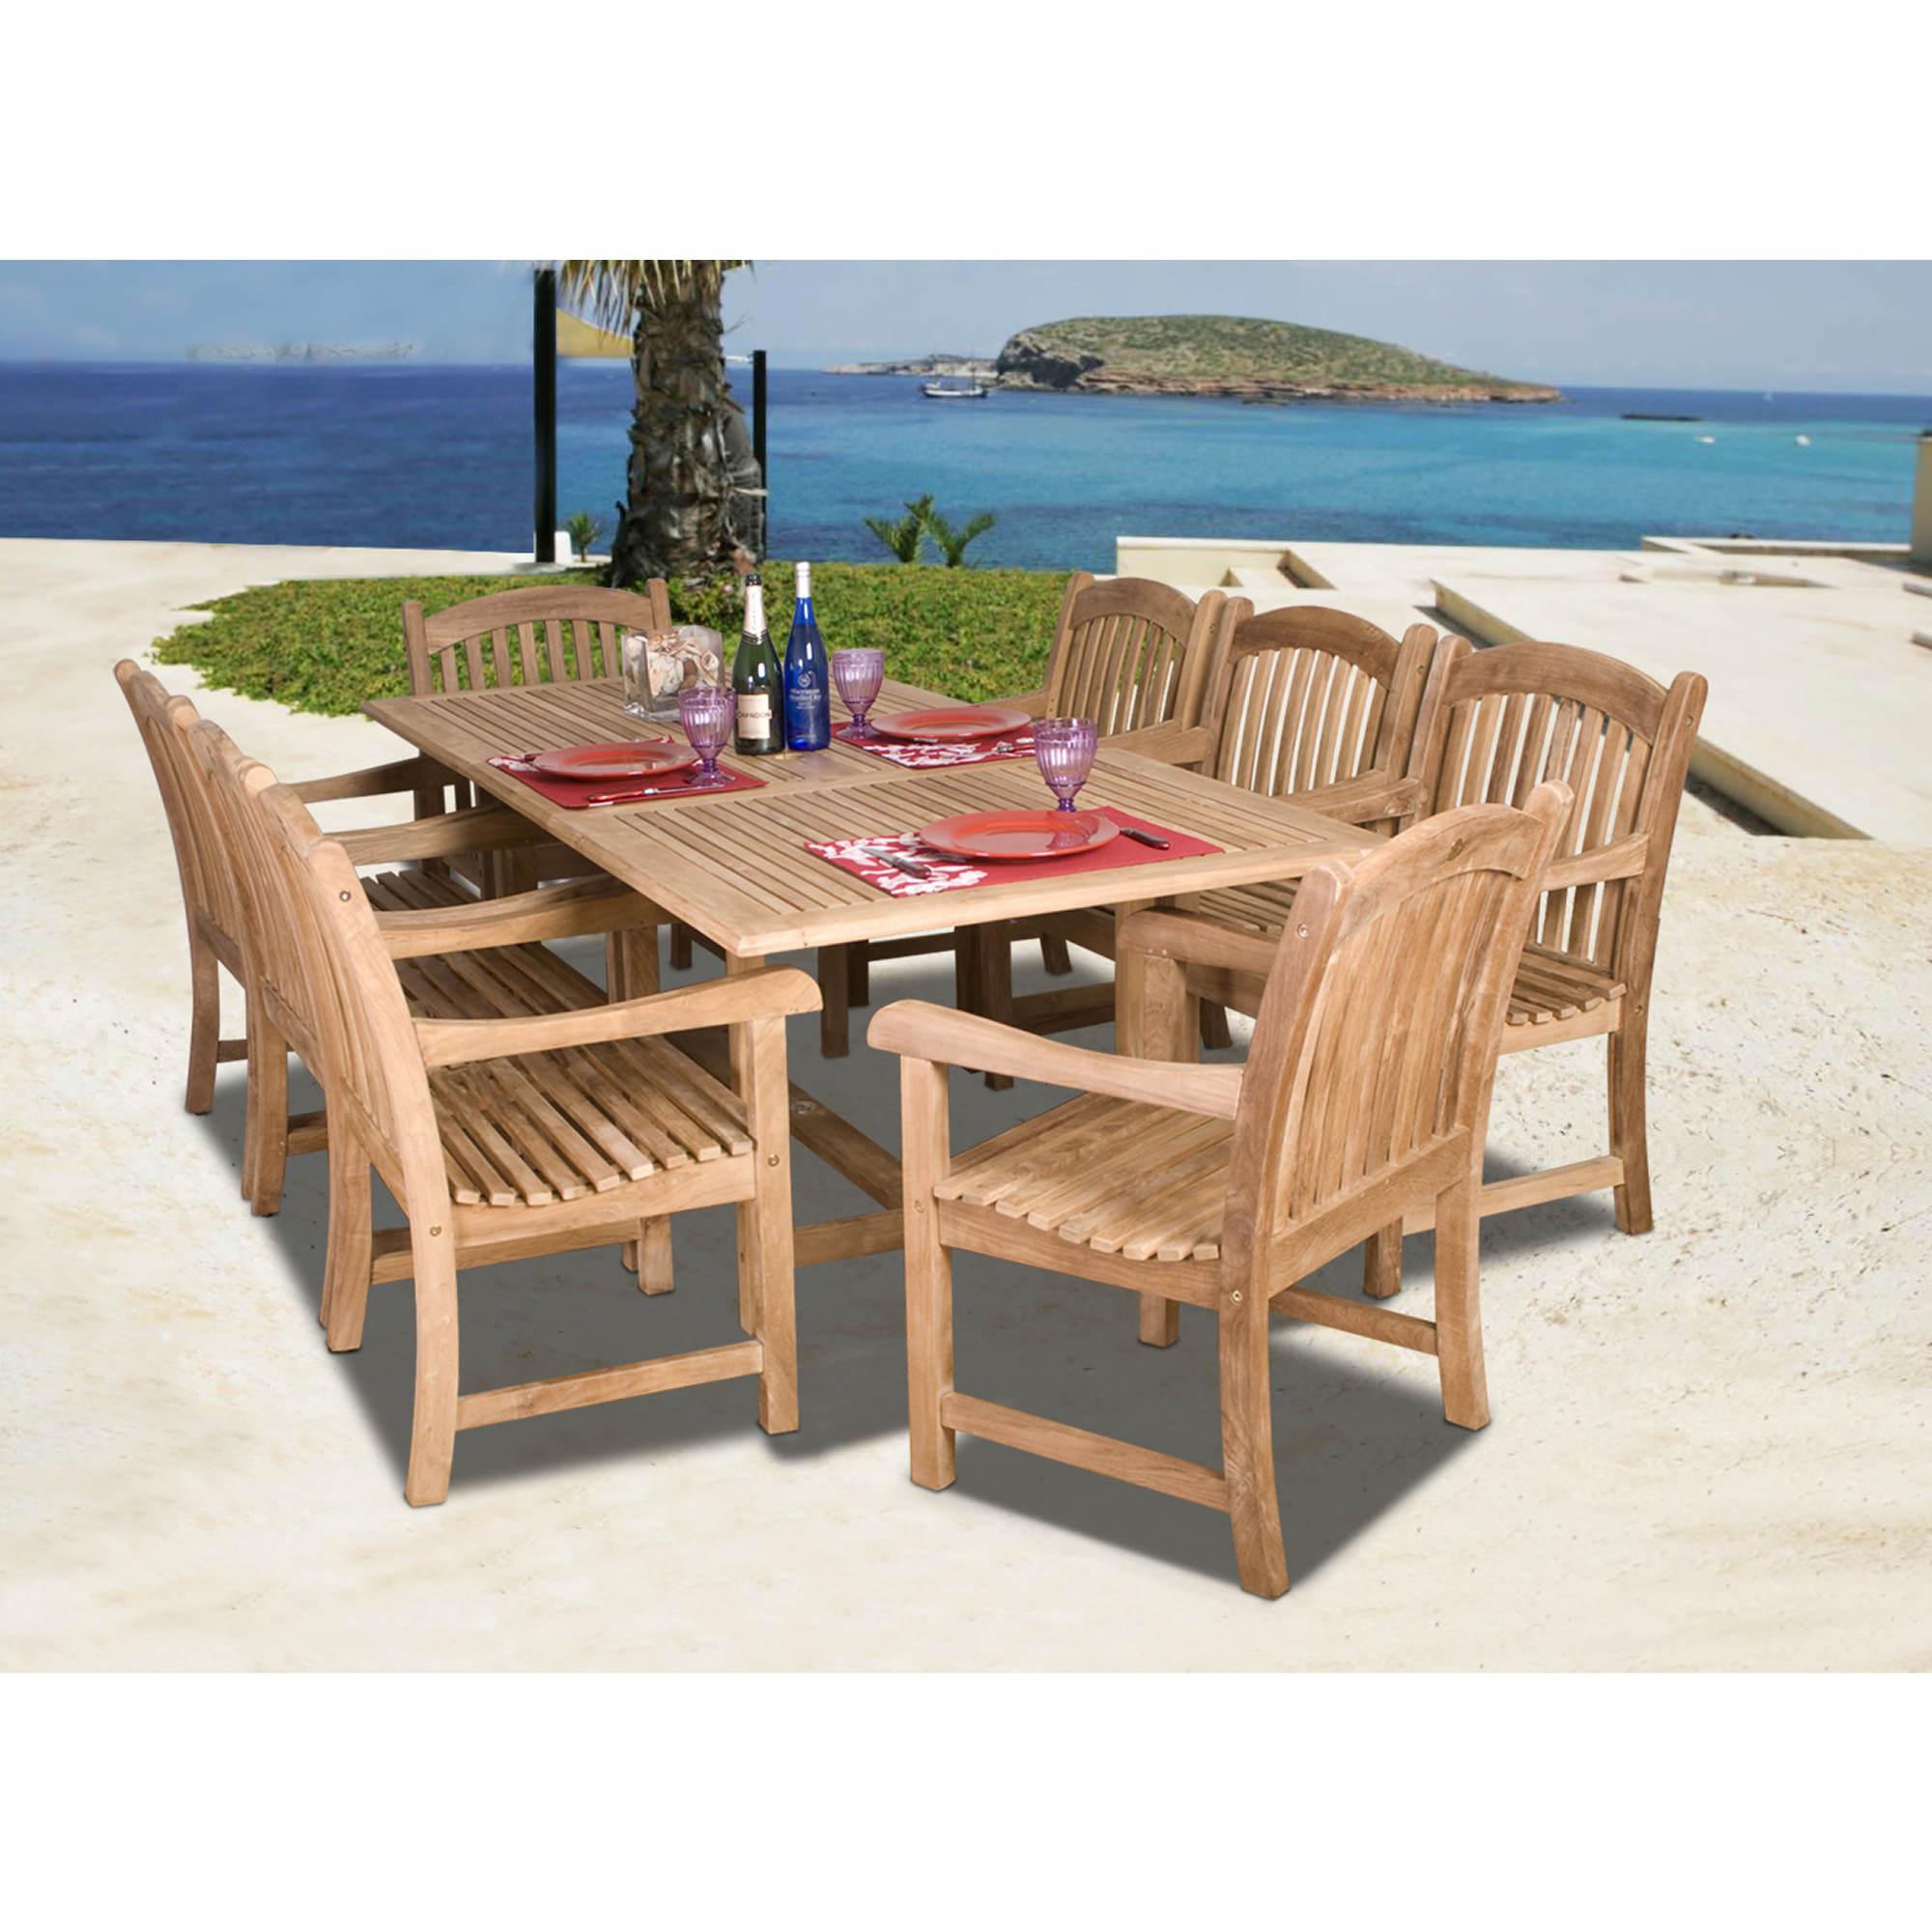 Amazonia Madison 9-Piece Teak Dining Set with Bonus Feron's Wood Sealer/Preservative